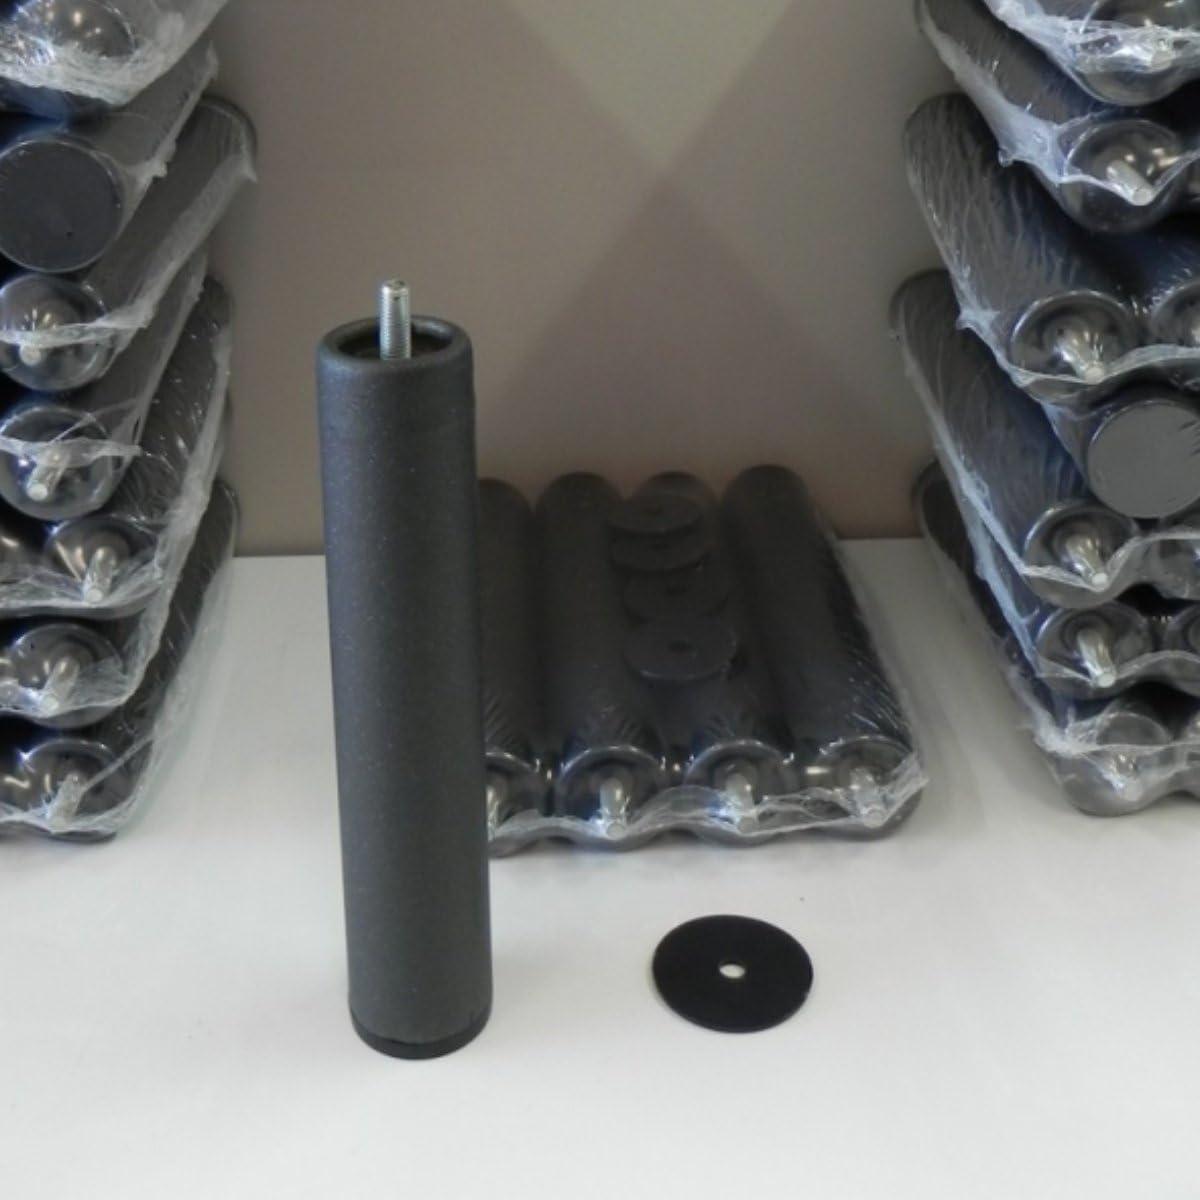 Abitti Somier multiláminas con REGULADORES LUMBARES + 4 Patas. 75x190cm, FIRMEZA Adaptable, Tubo 40x30MM y LÁMINAS de Haya Natural Antideslizantes.